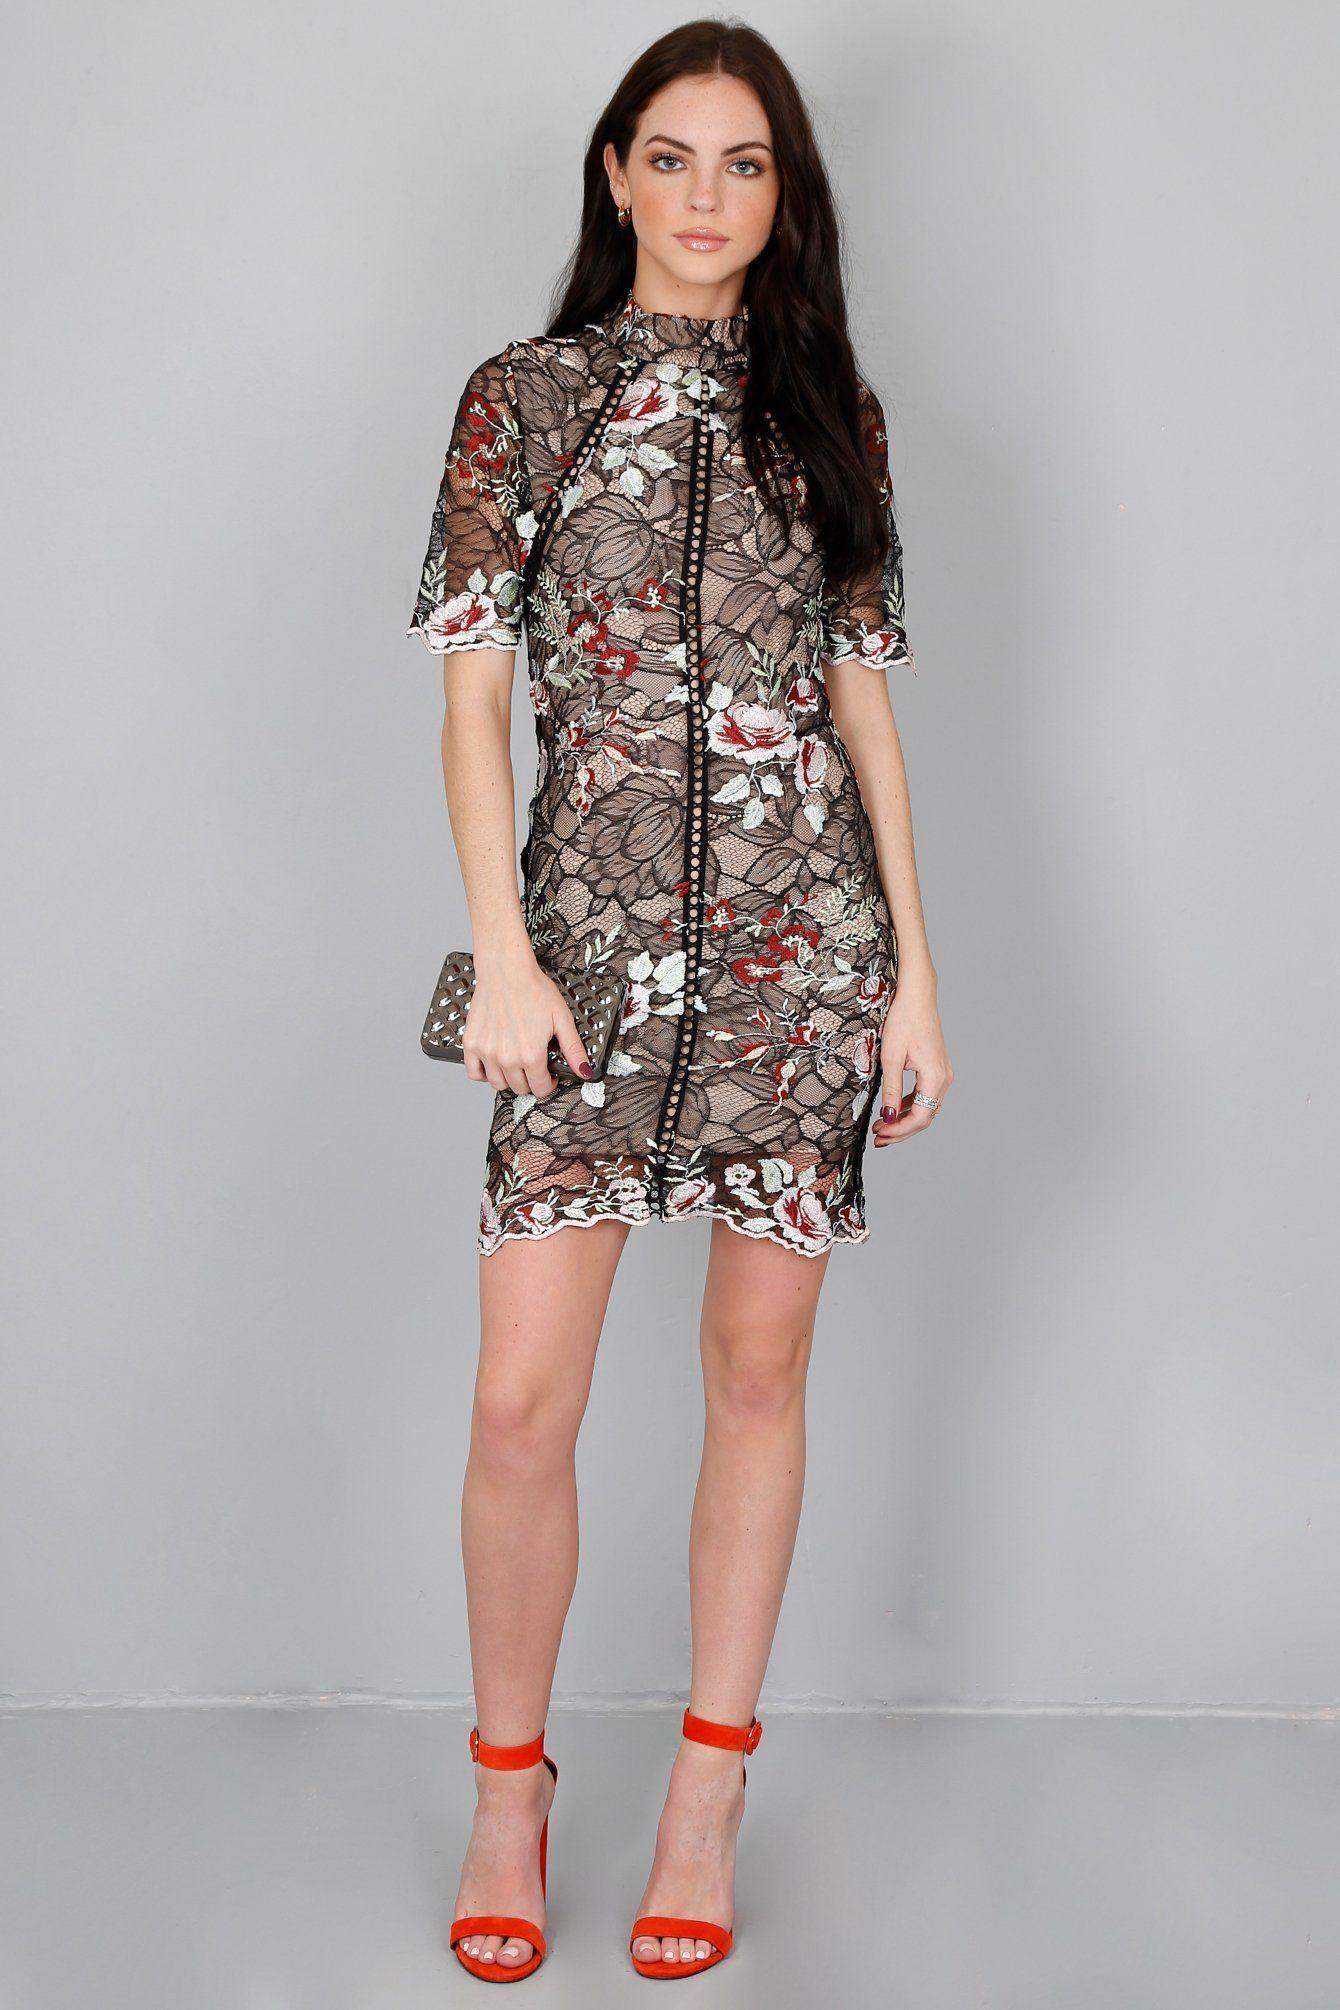 Winona grimaldi short dress black short dresses pinterest